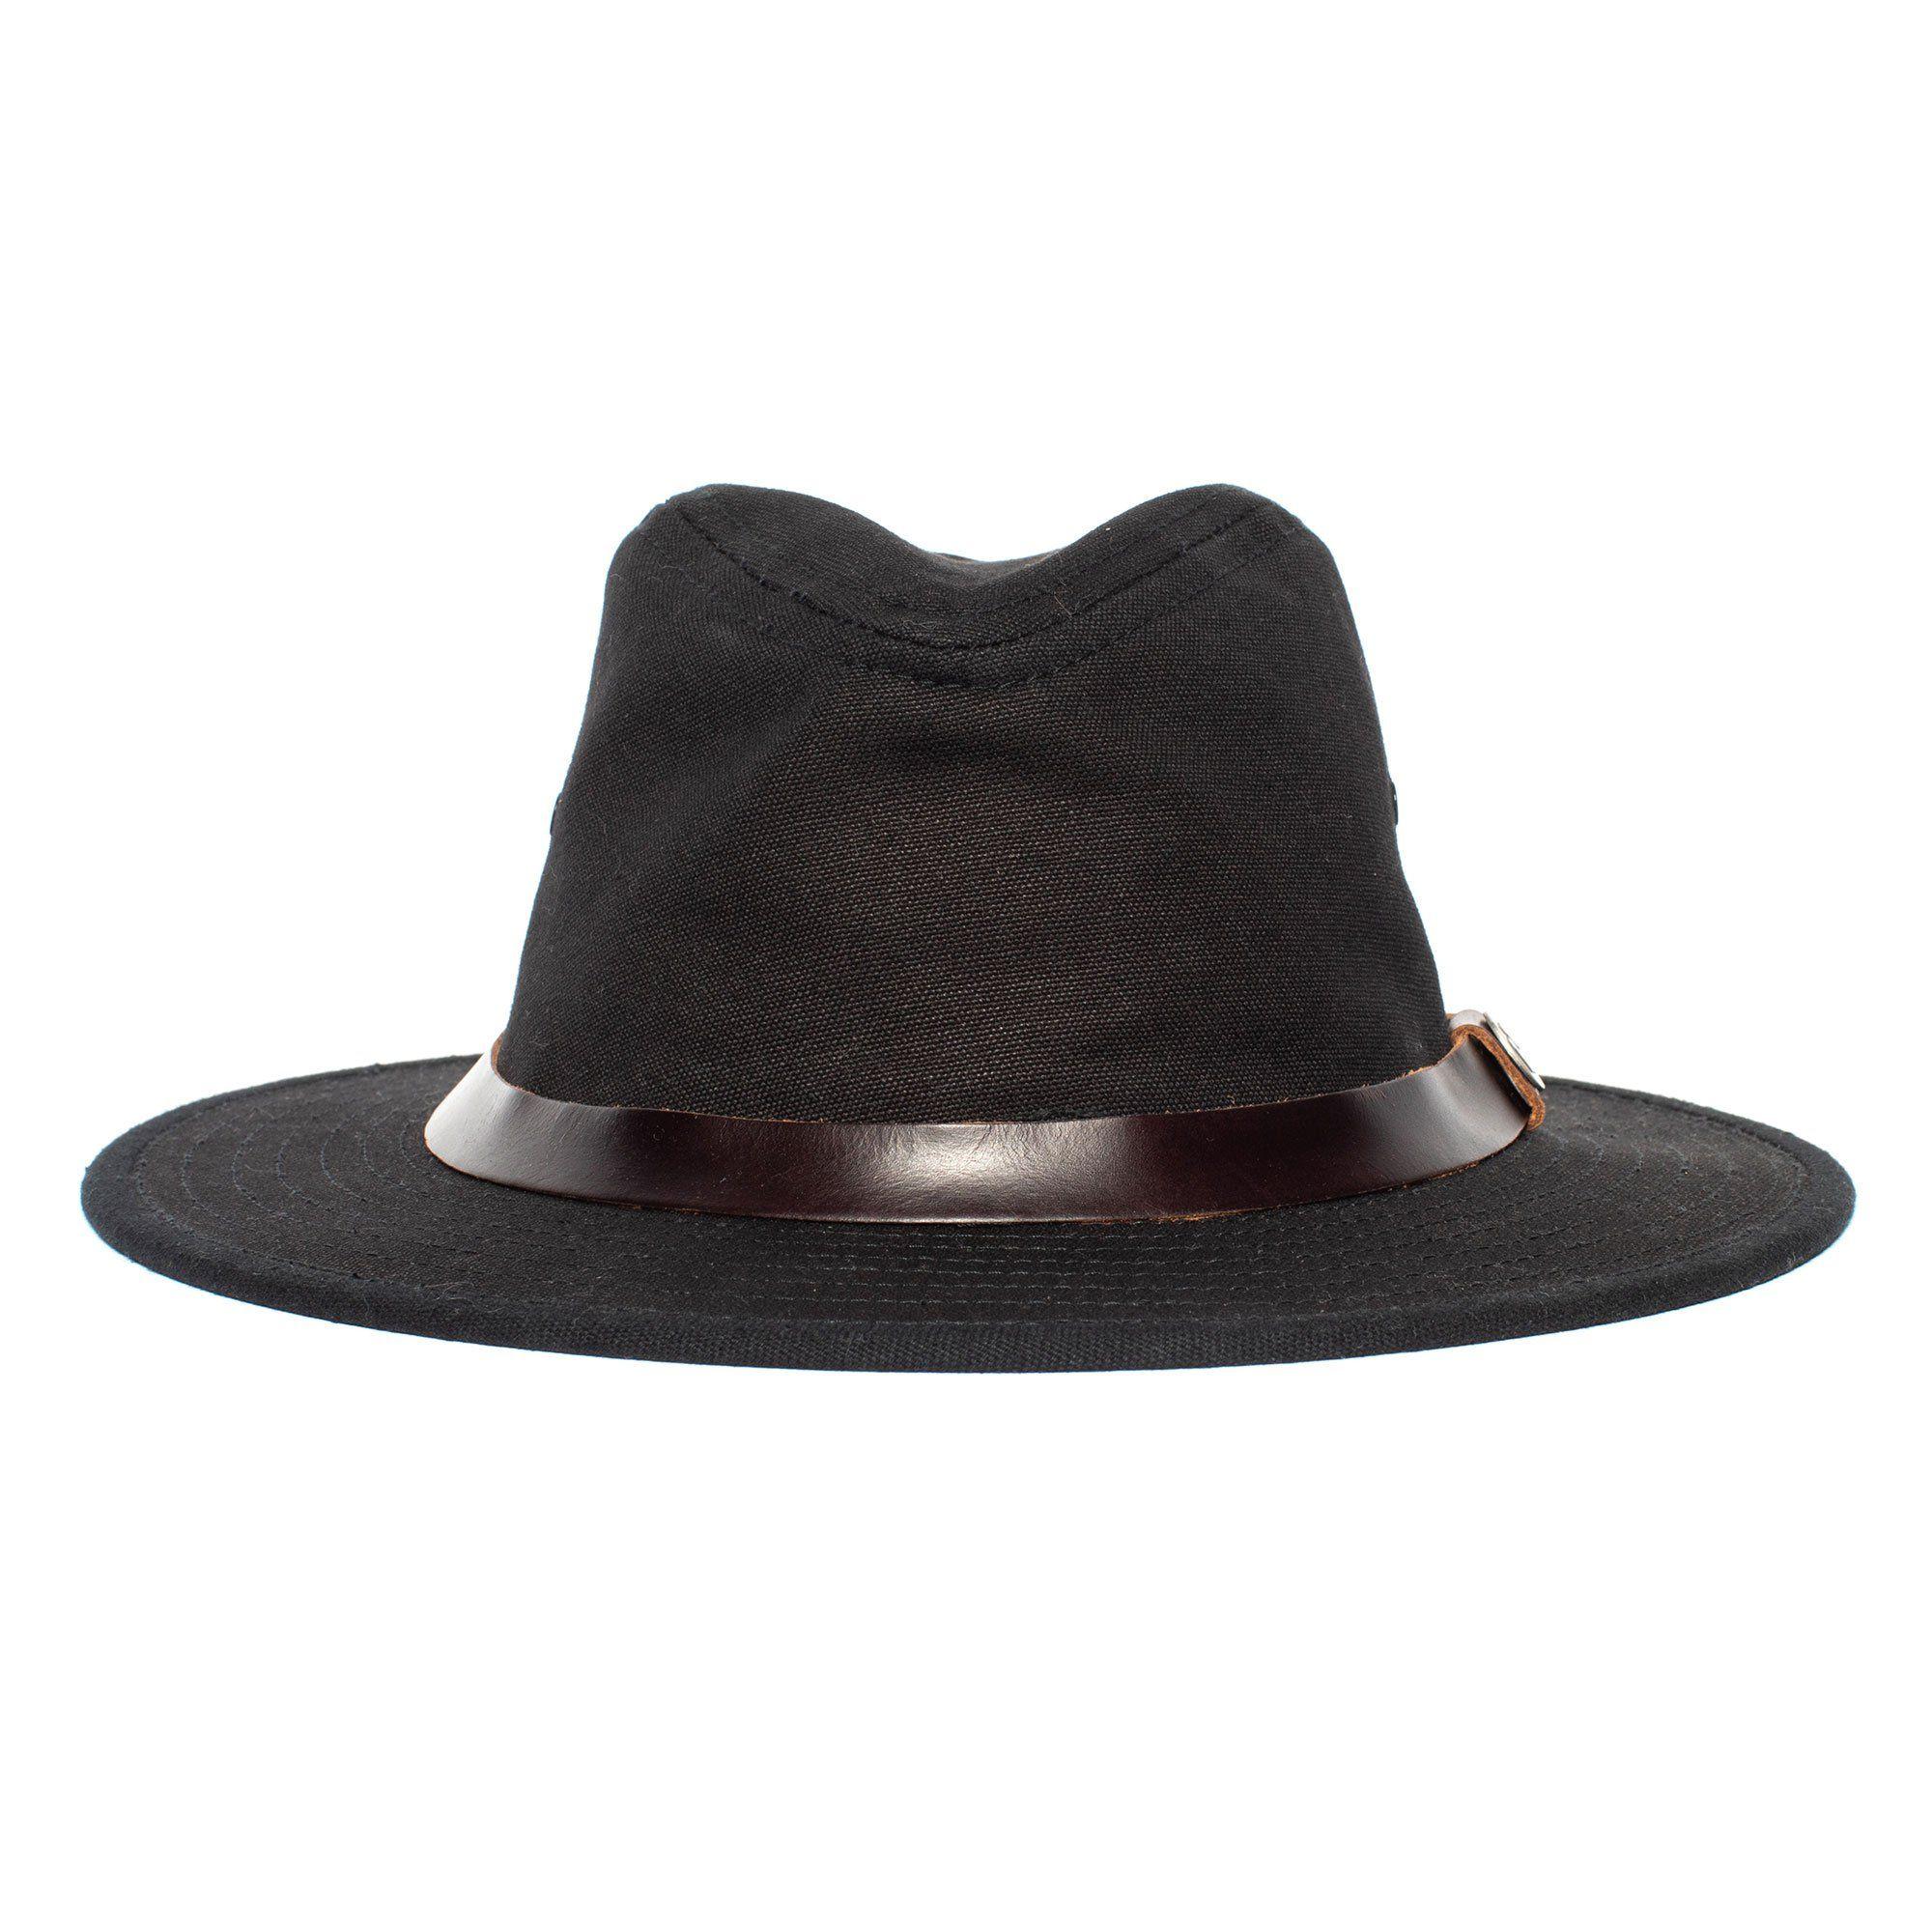 Goorin Urban Hiker Fedora Hat In Black Size Large Fedora Wide Brim Fedora Goorin